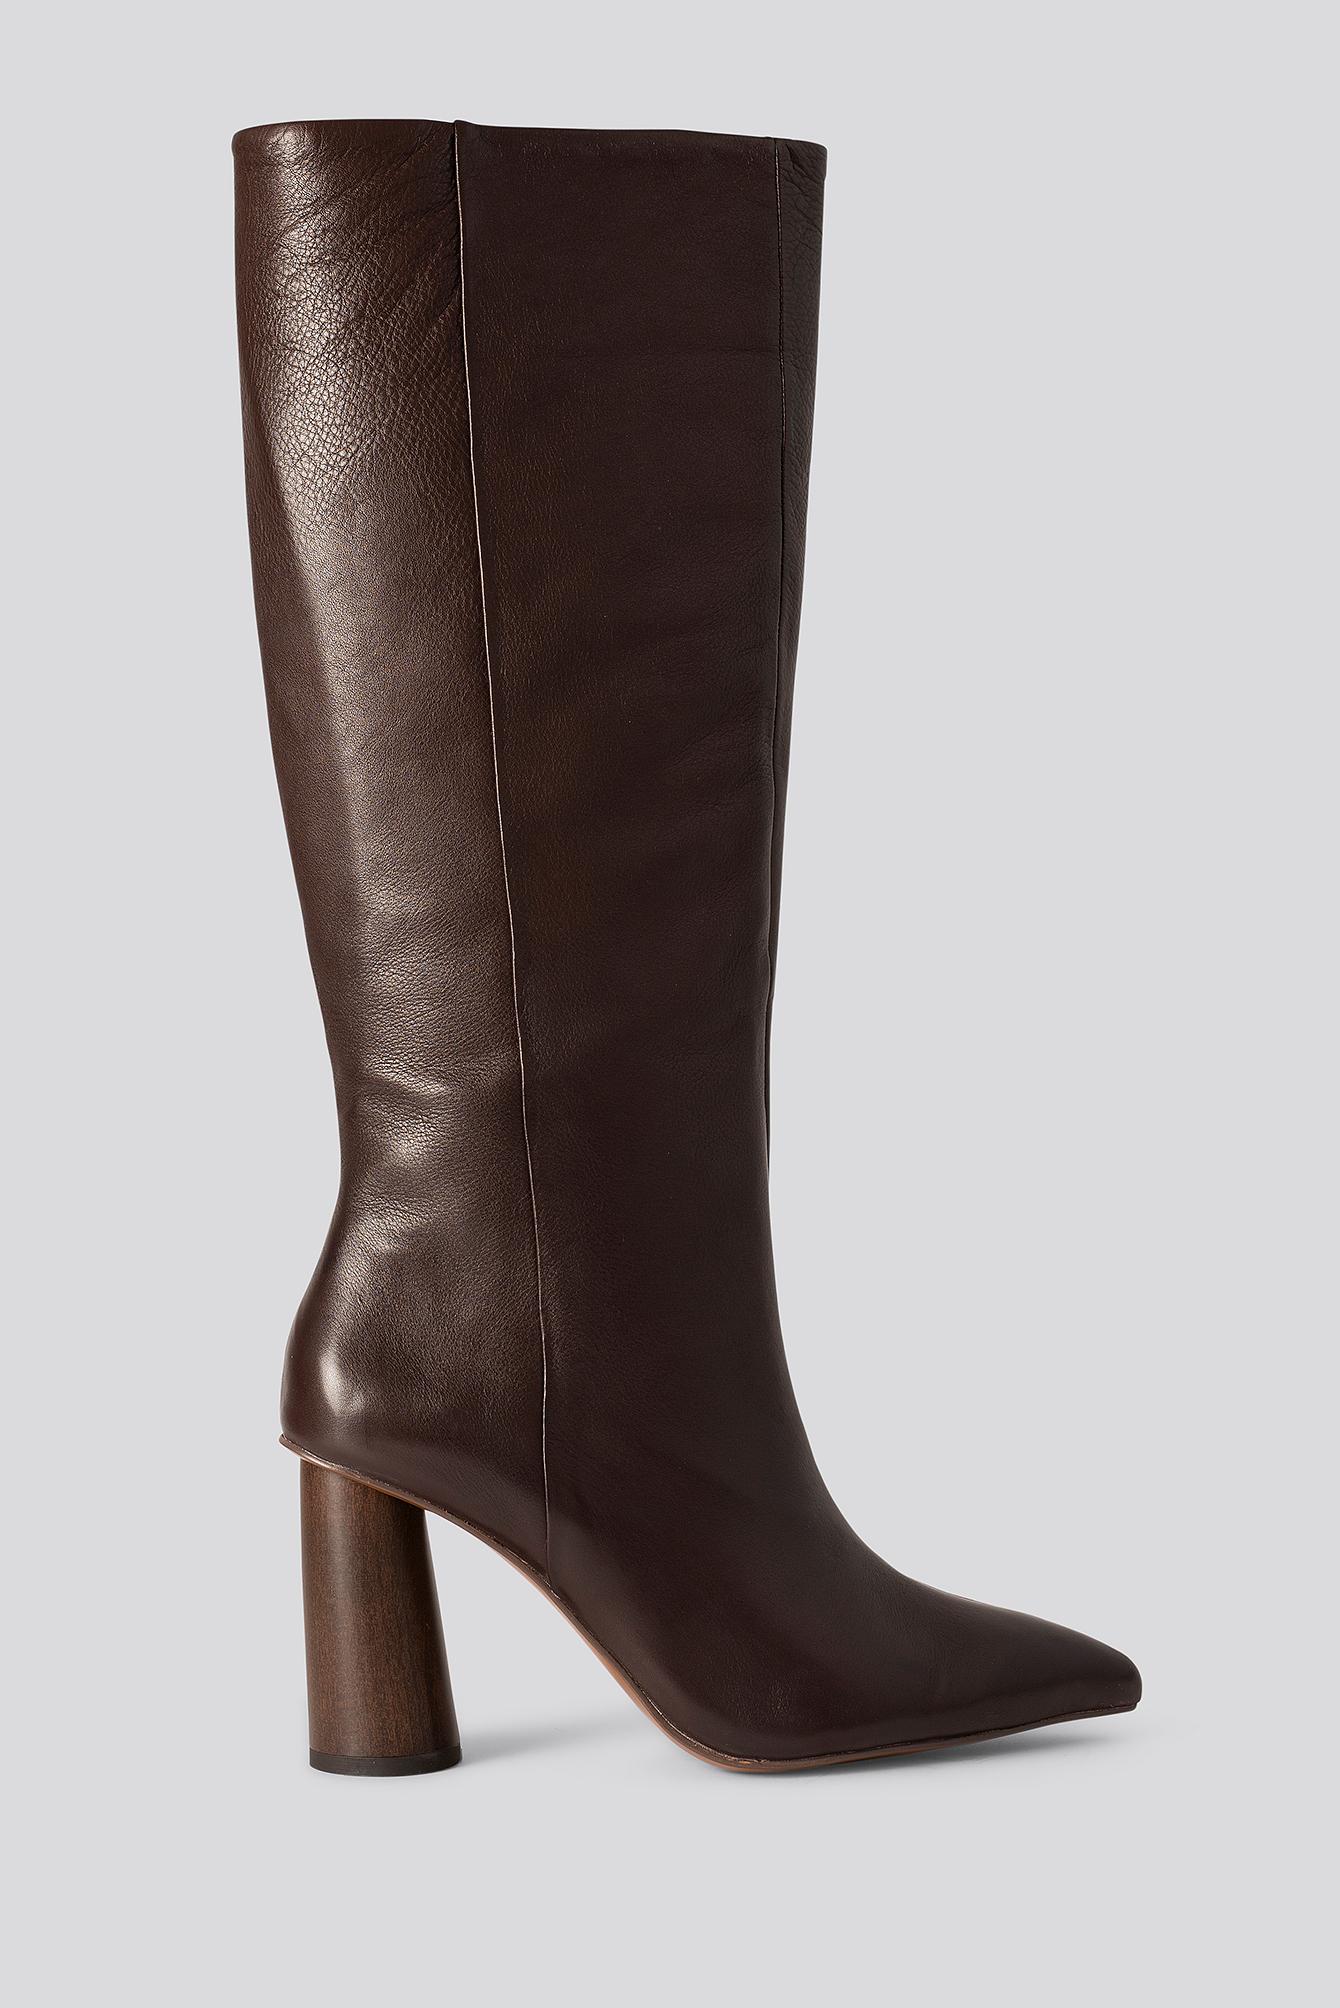 MANGO Wood Boots - Brown